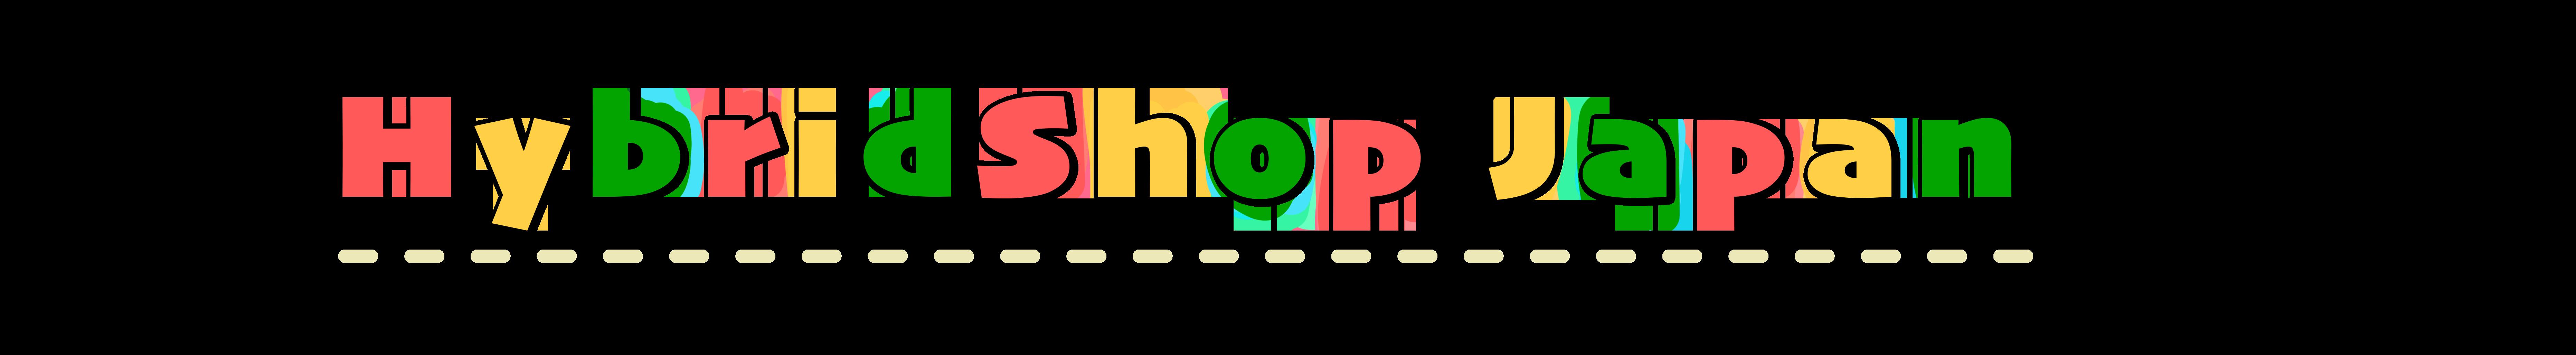 HybridShop Japan (ハイブリッドショップジャパン)